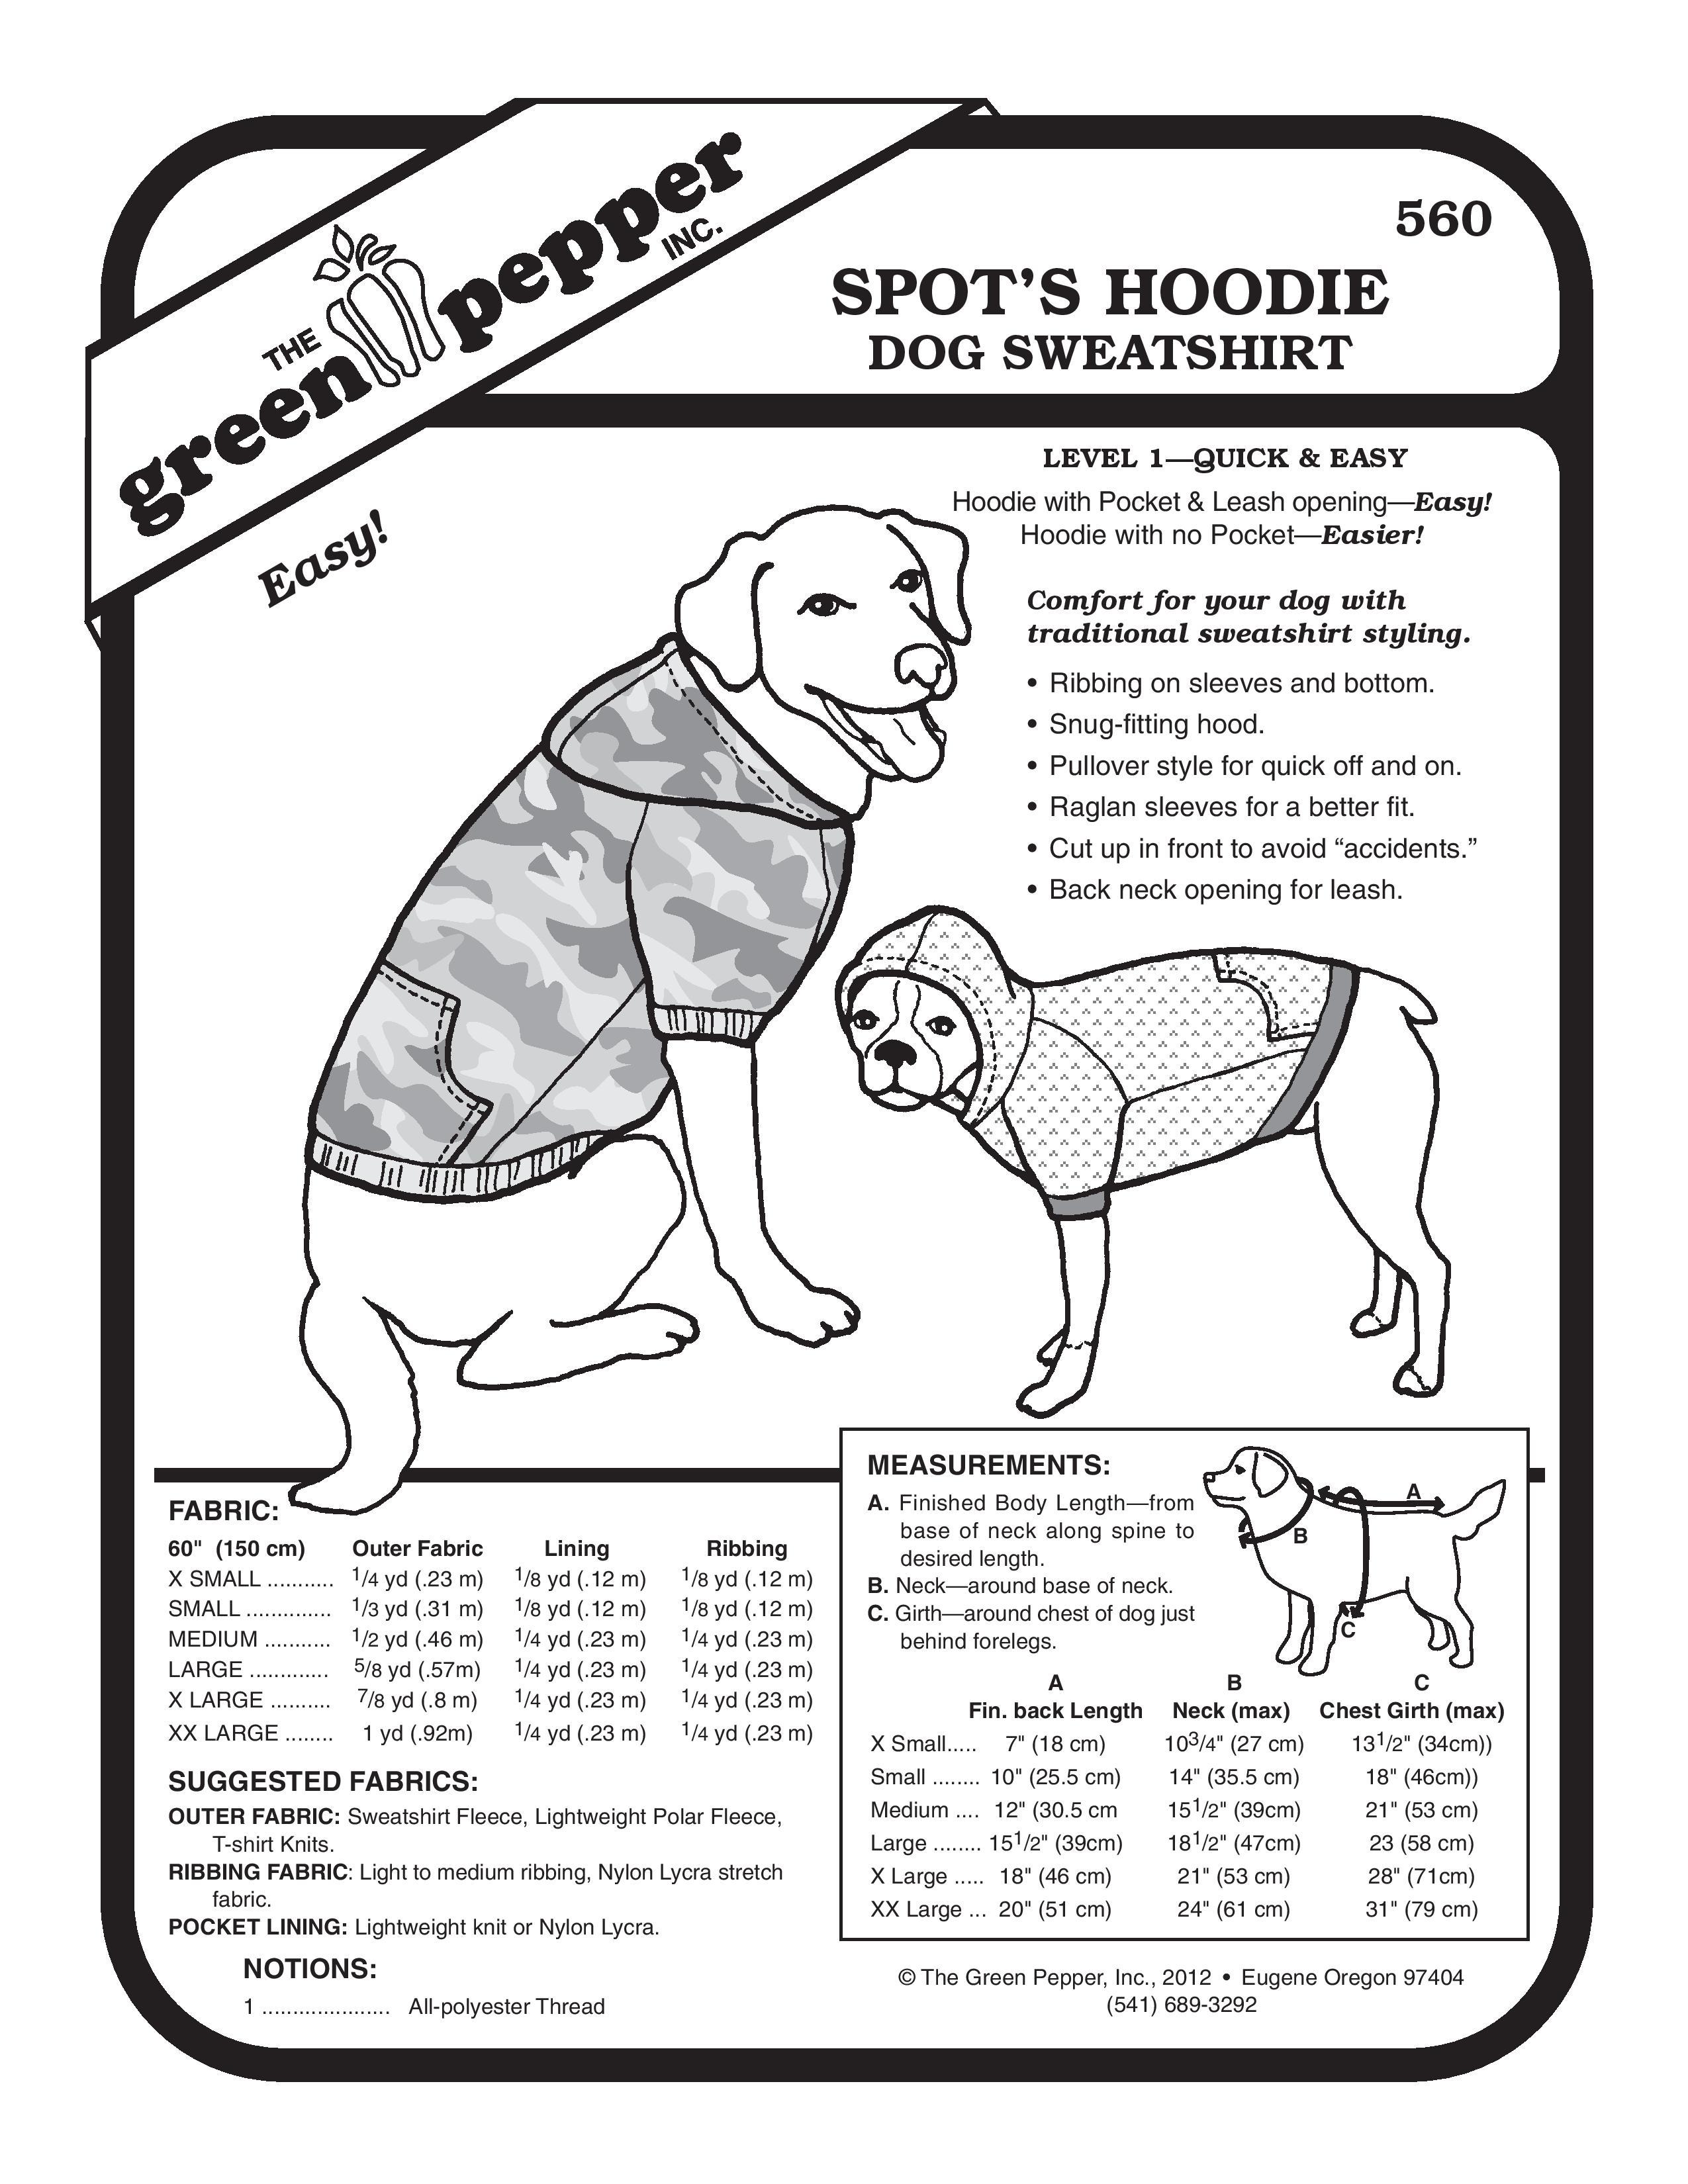 Spot\'s Hoodie Dog Sweatshirt Sewing Pattern